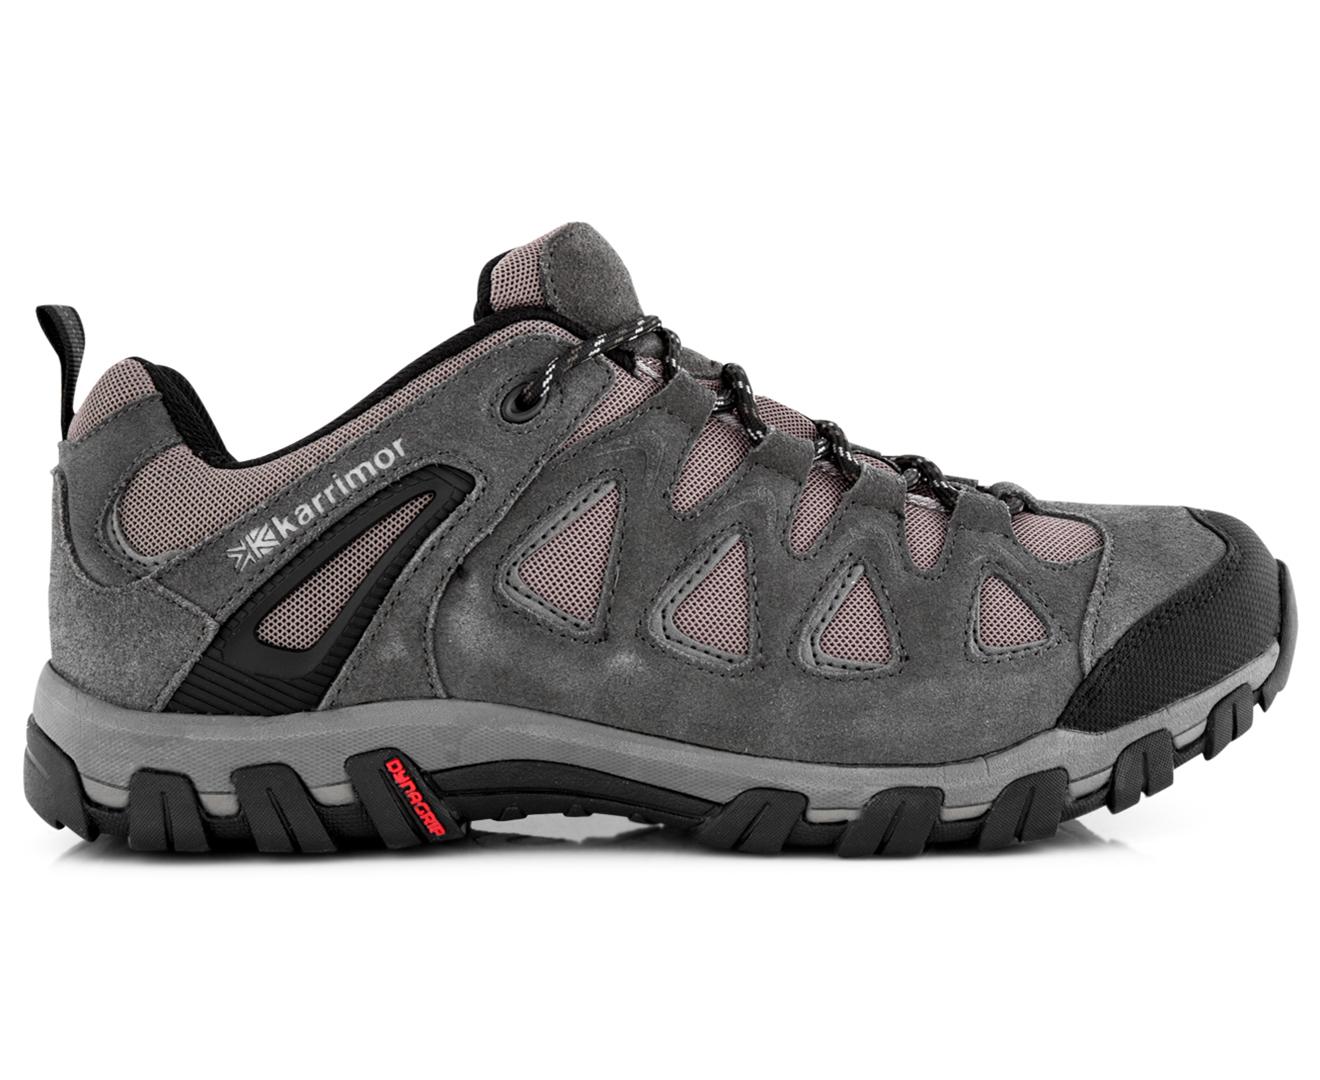 Supa 5, Mens Trekking & Hiking Shoes Karrimor